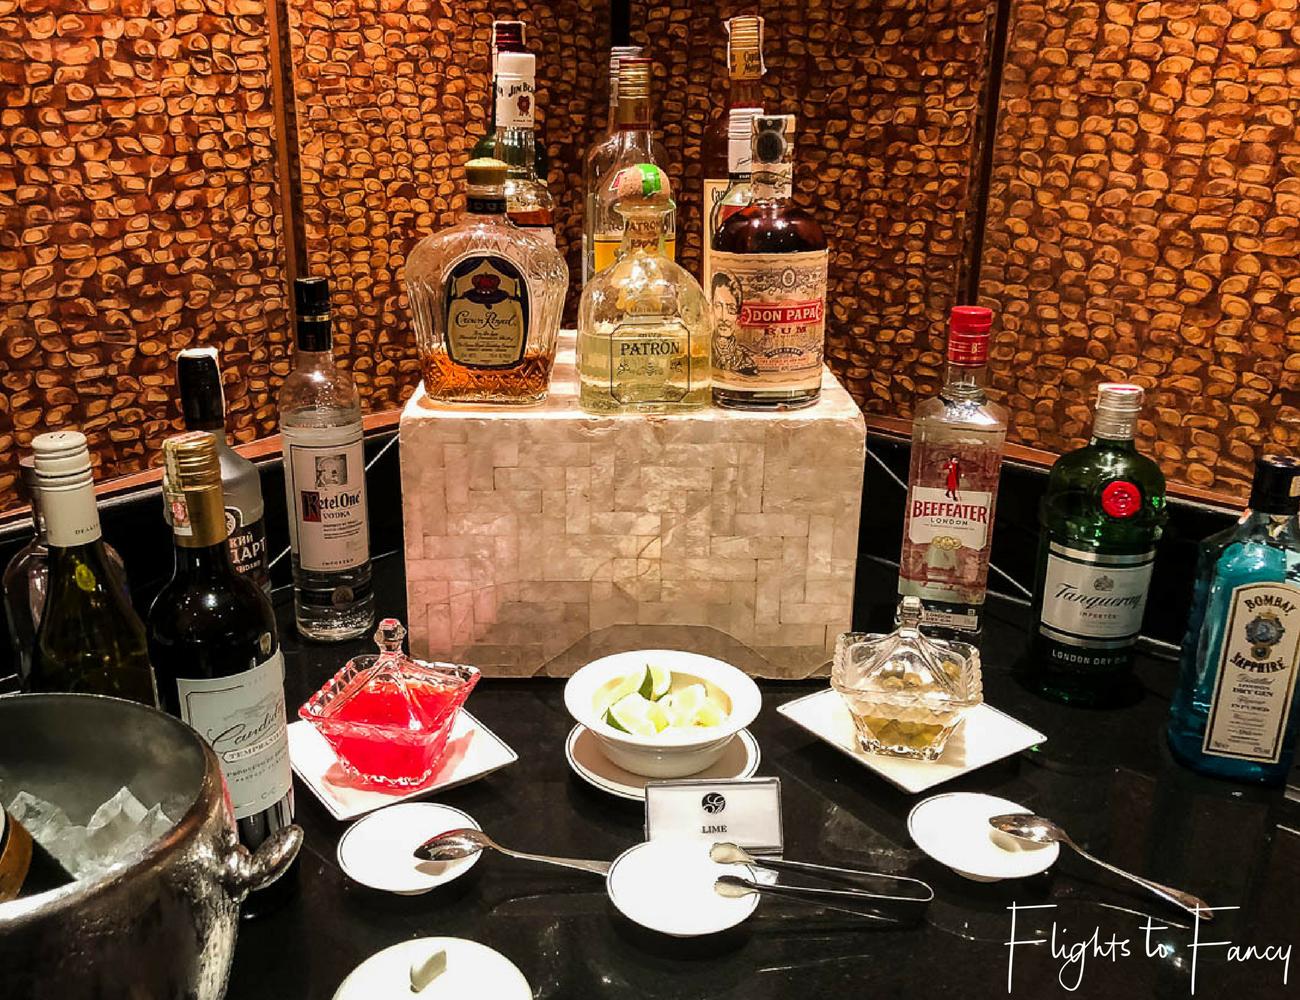 Flights to Fancy - Fairmont Makati Gold Lounge Spirits Bar